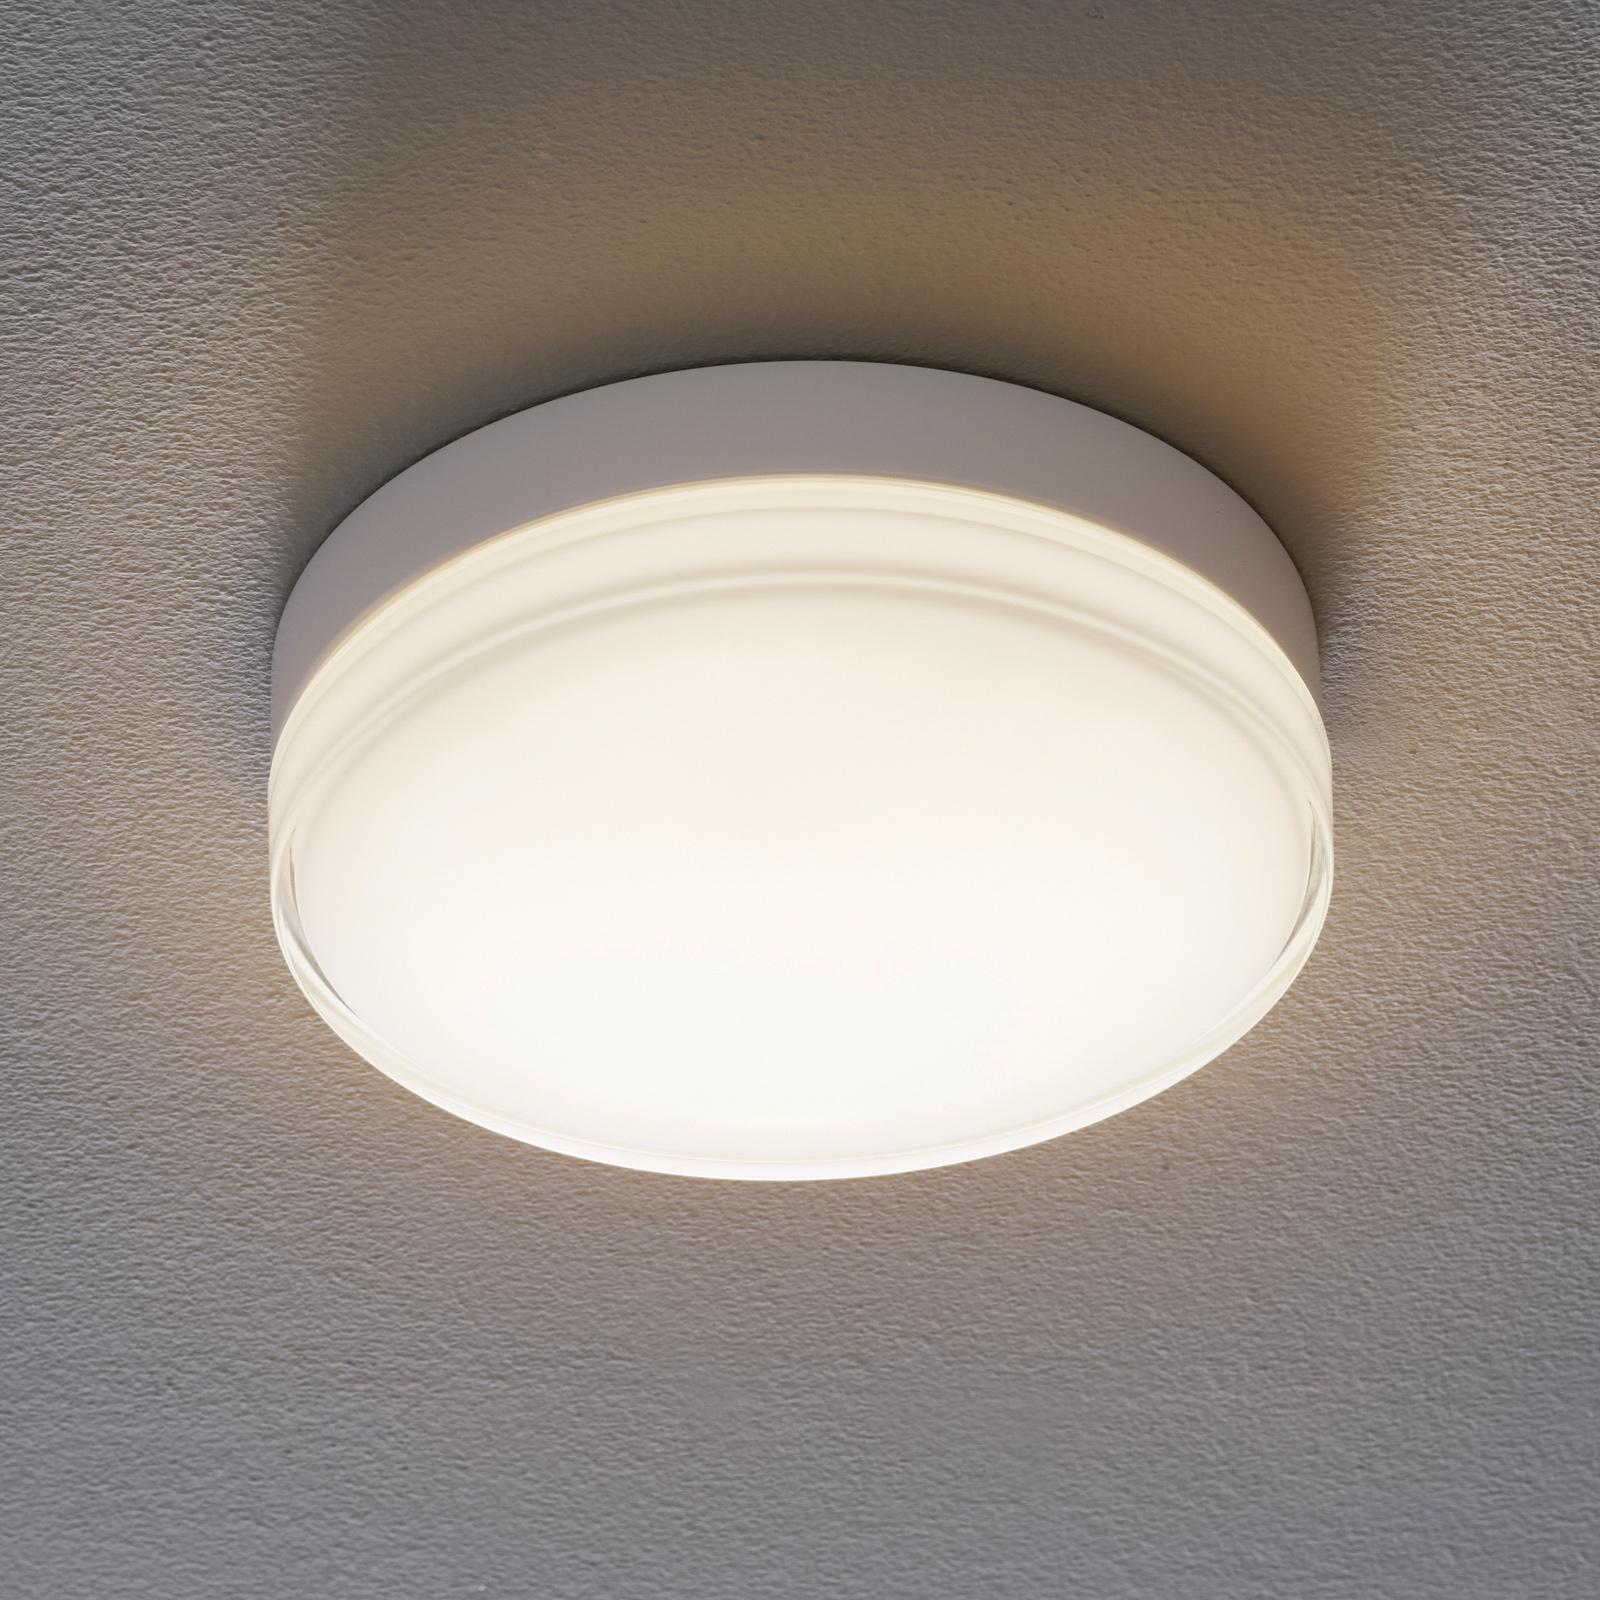 BEGA 12128 LED-taklampe DALI 930 hvit 26cm